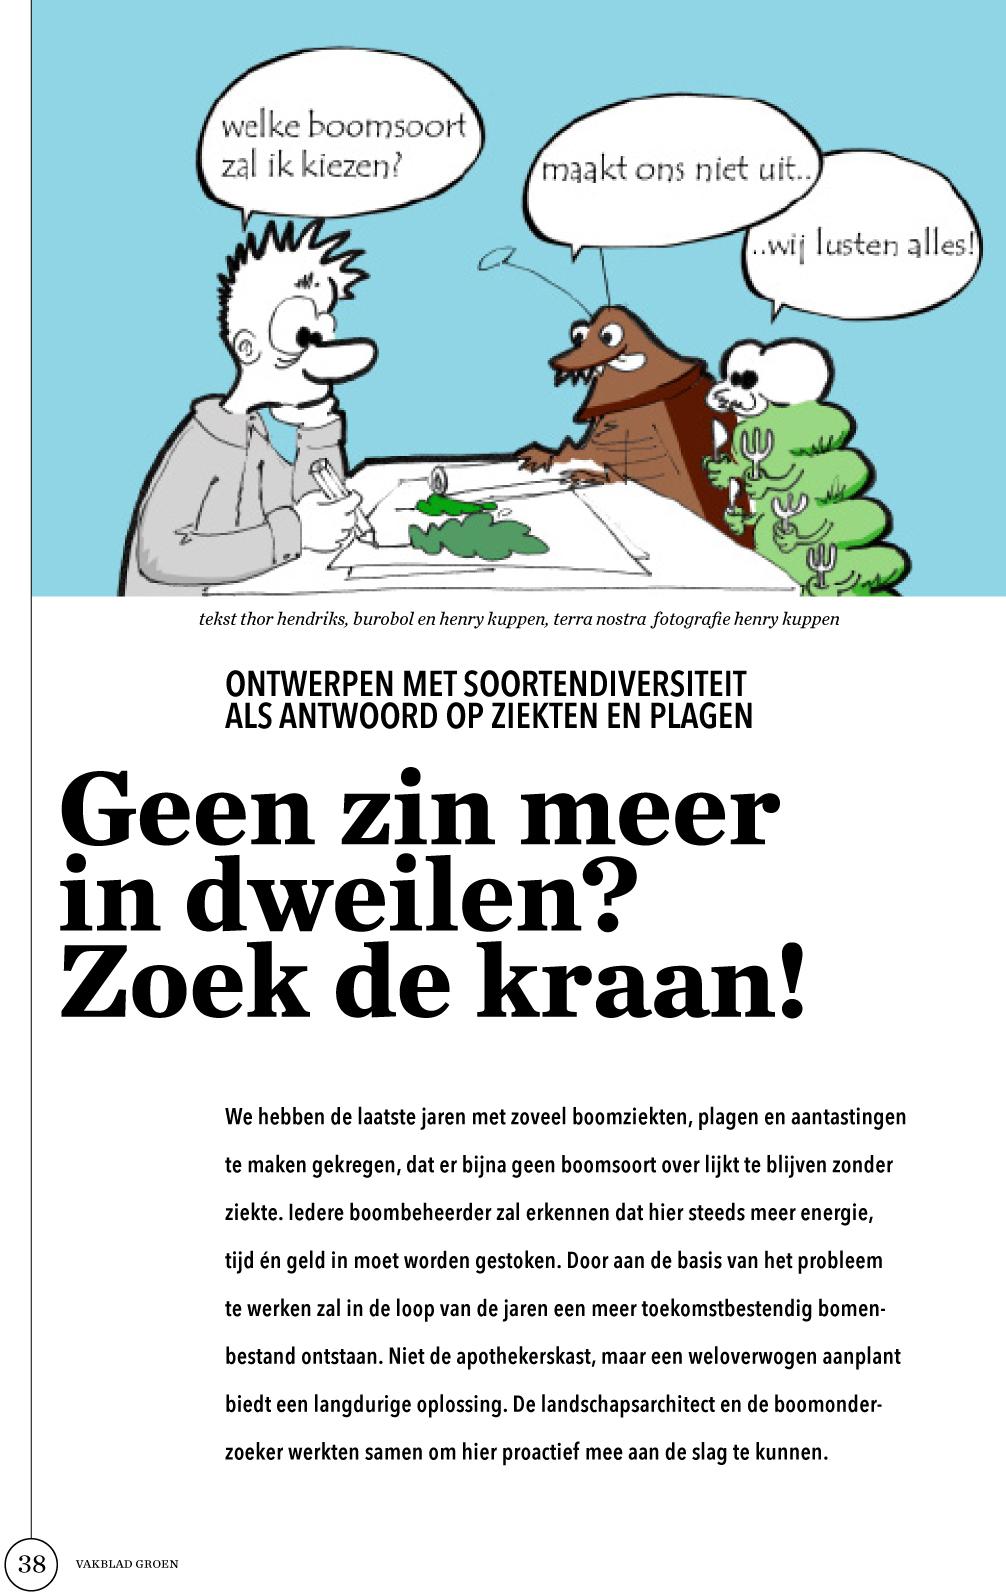 2015_0823_Vakblad_Groen_artikel-1